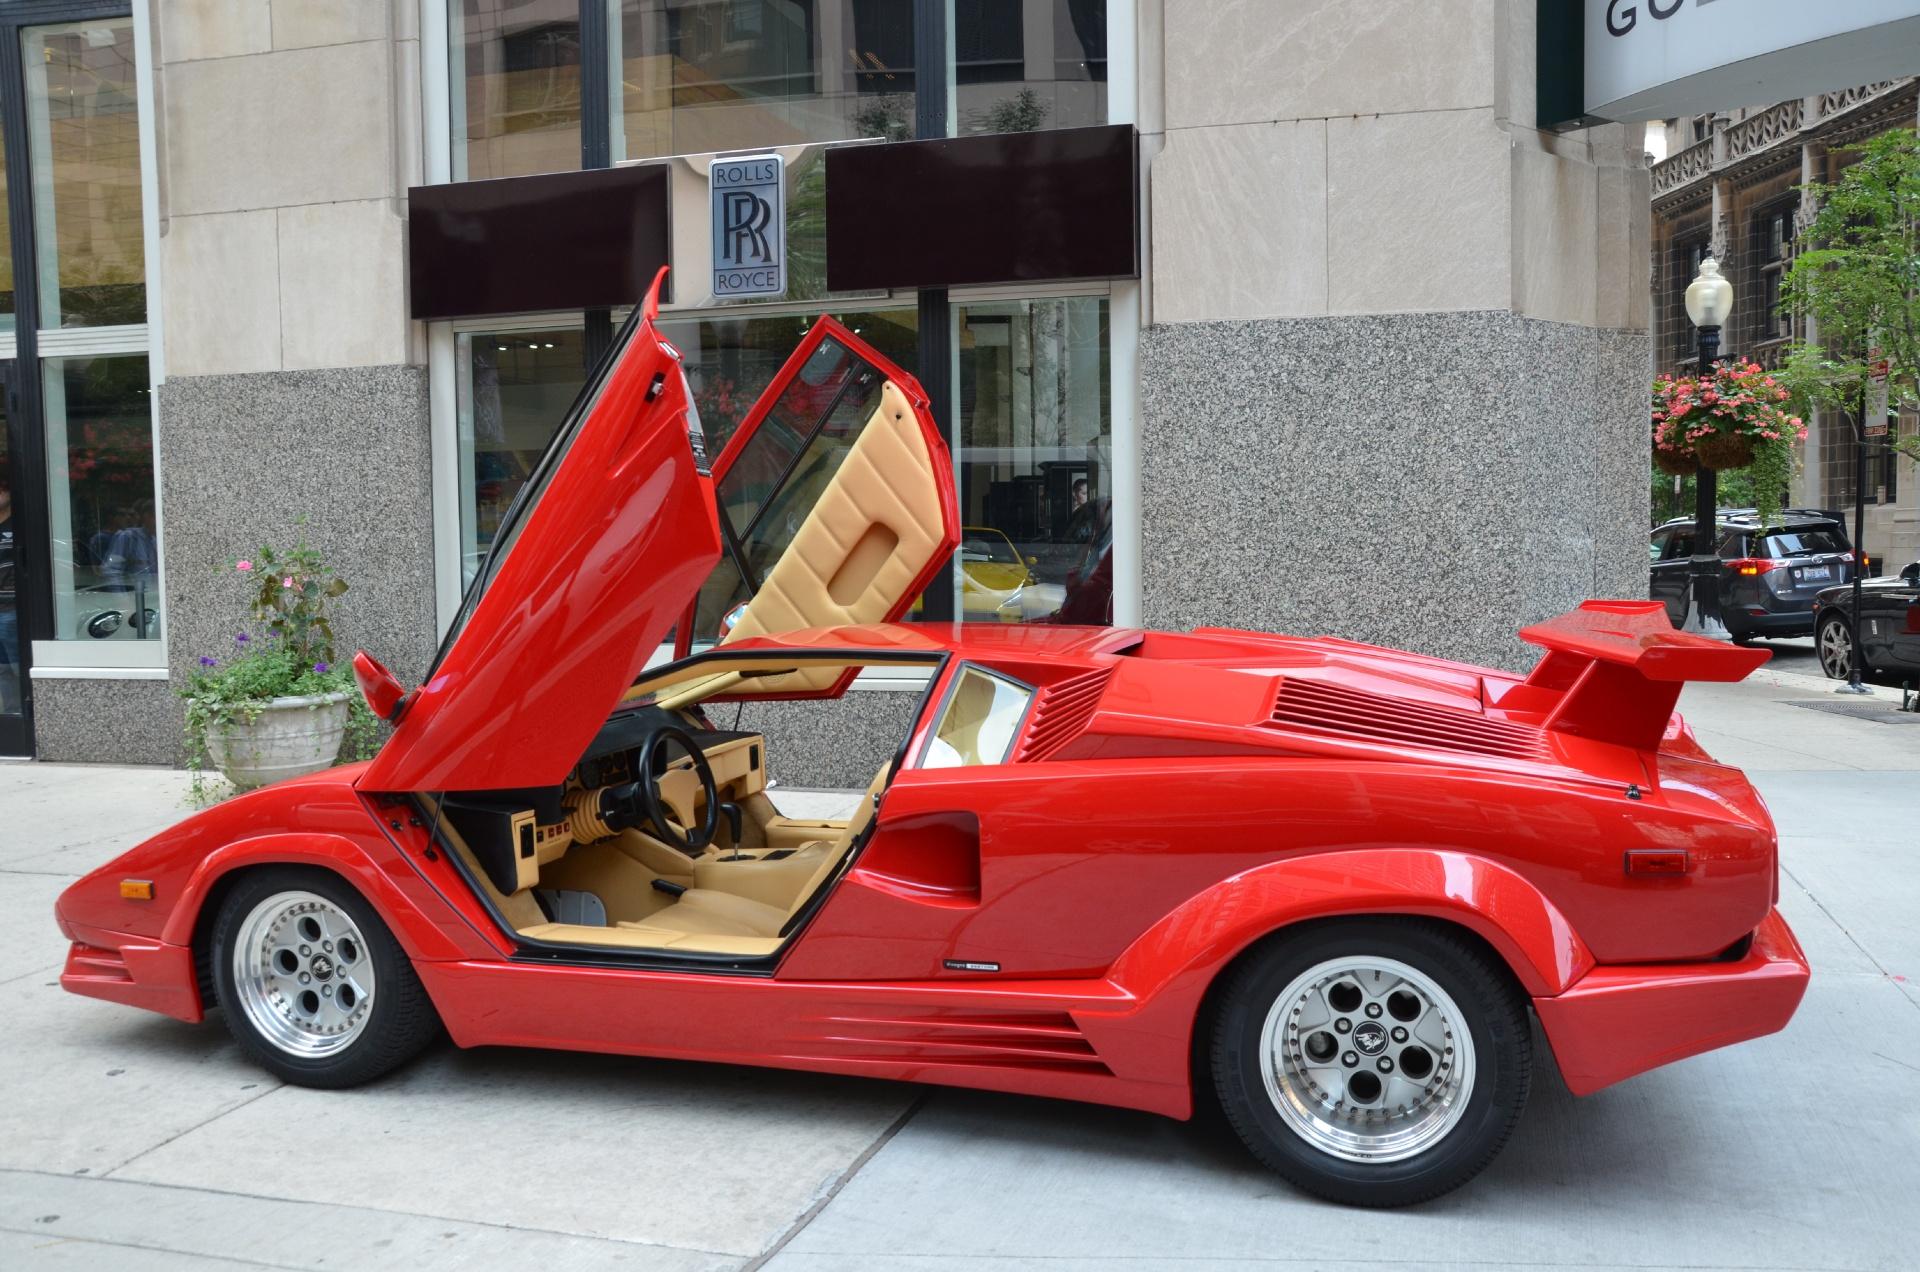 4875_p8_l Elegant Lamborghini Countach 25th Anniversary Specs Cars Trend